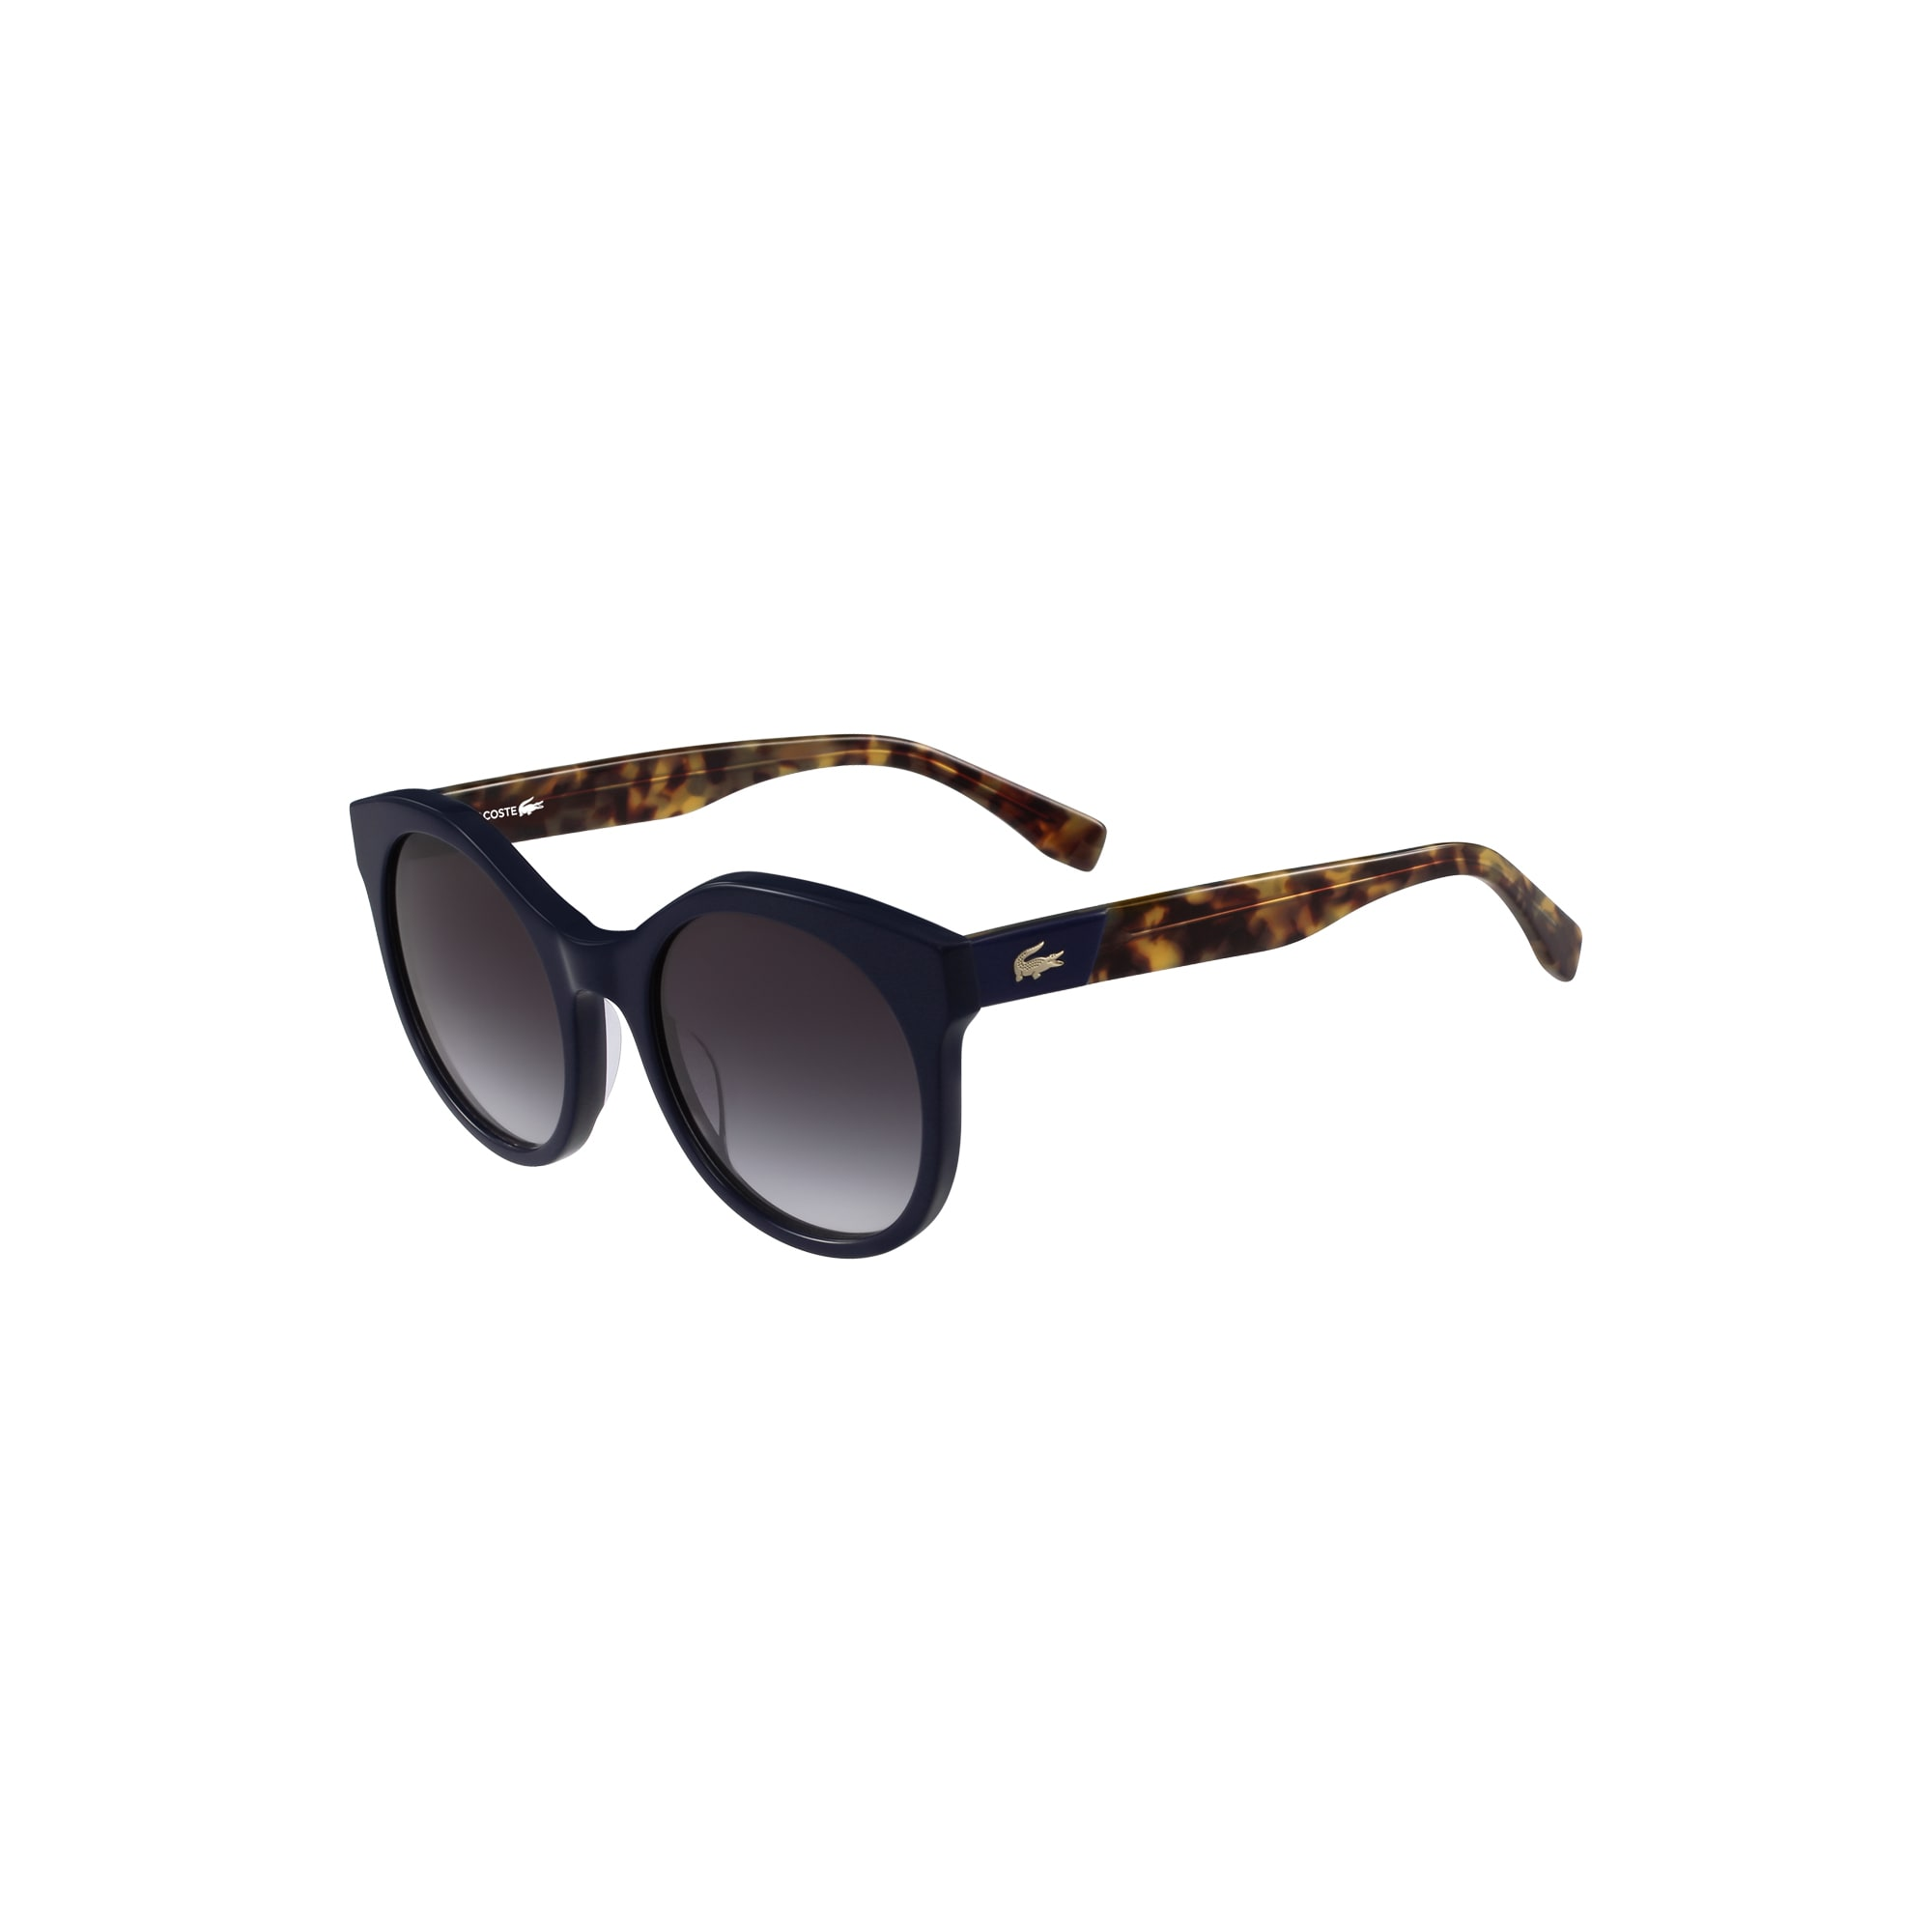 Women's Vintage Inspired Round Sunglasses